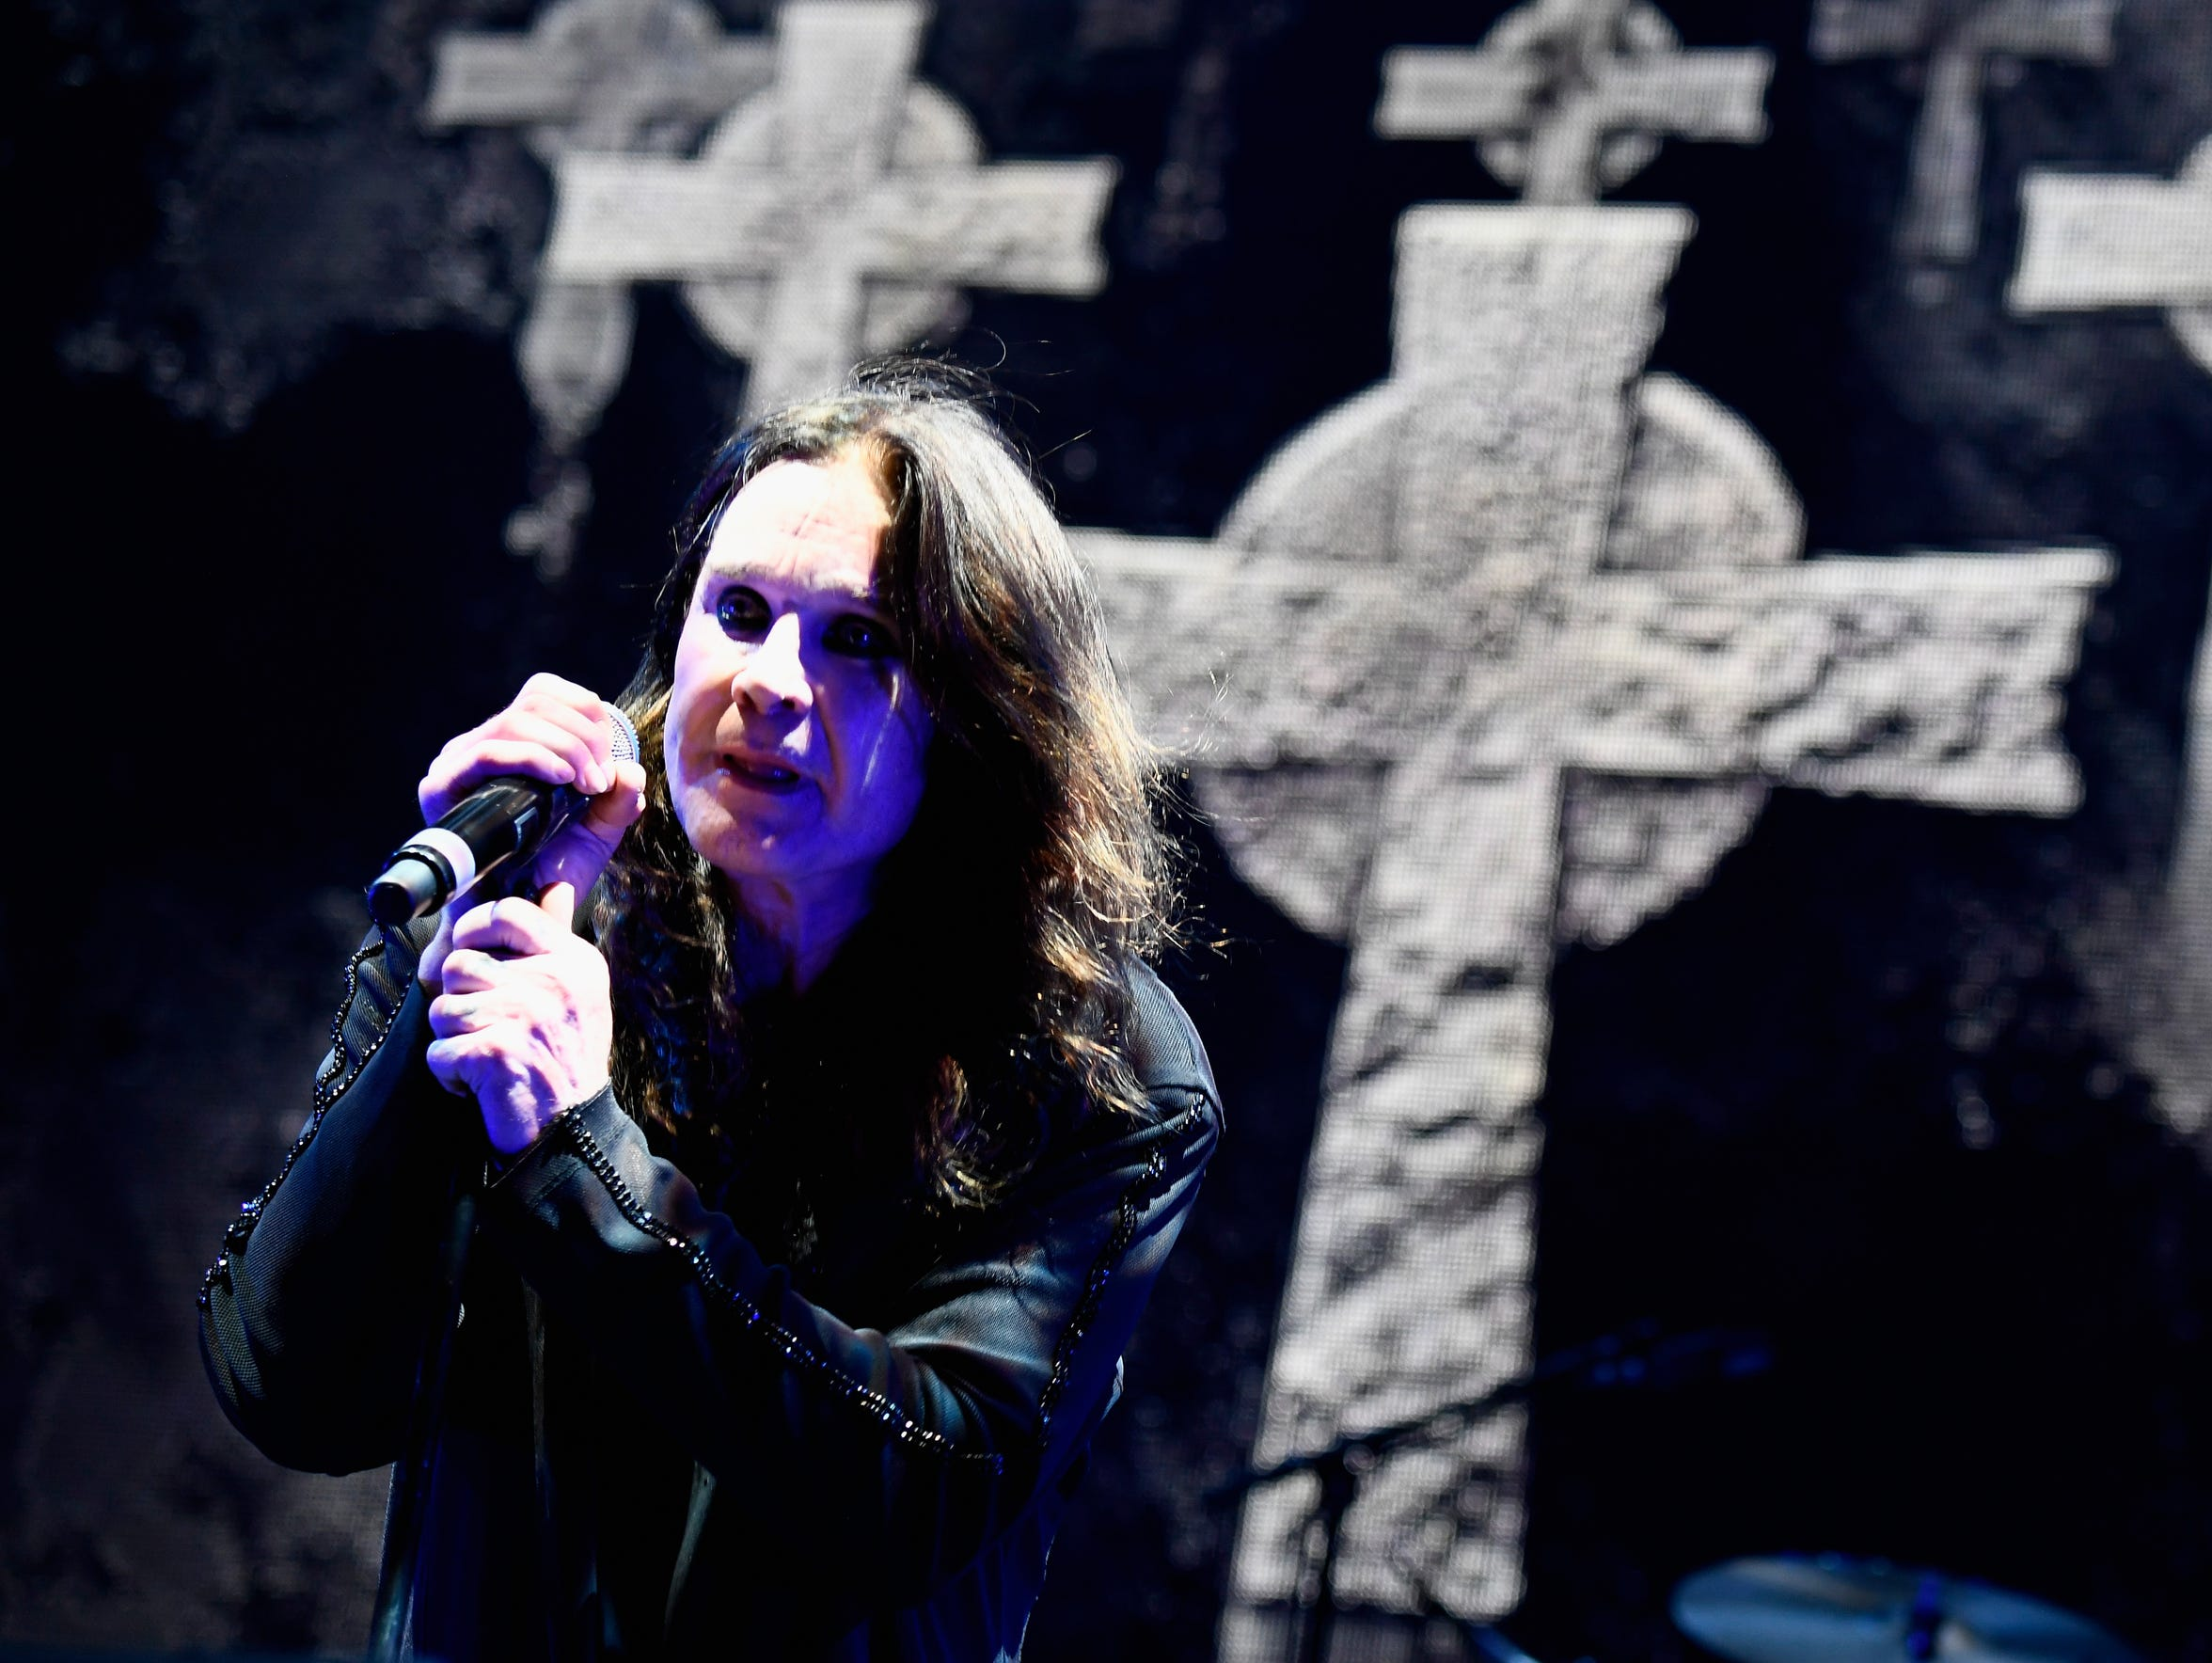 Ozzy Osbourne will descend upon Oshkosh for Rock USA.